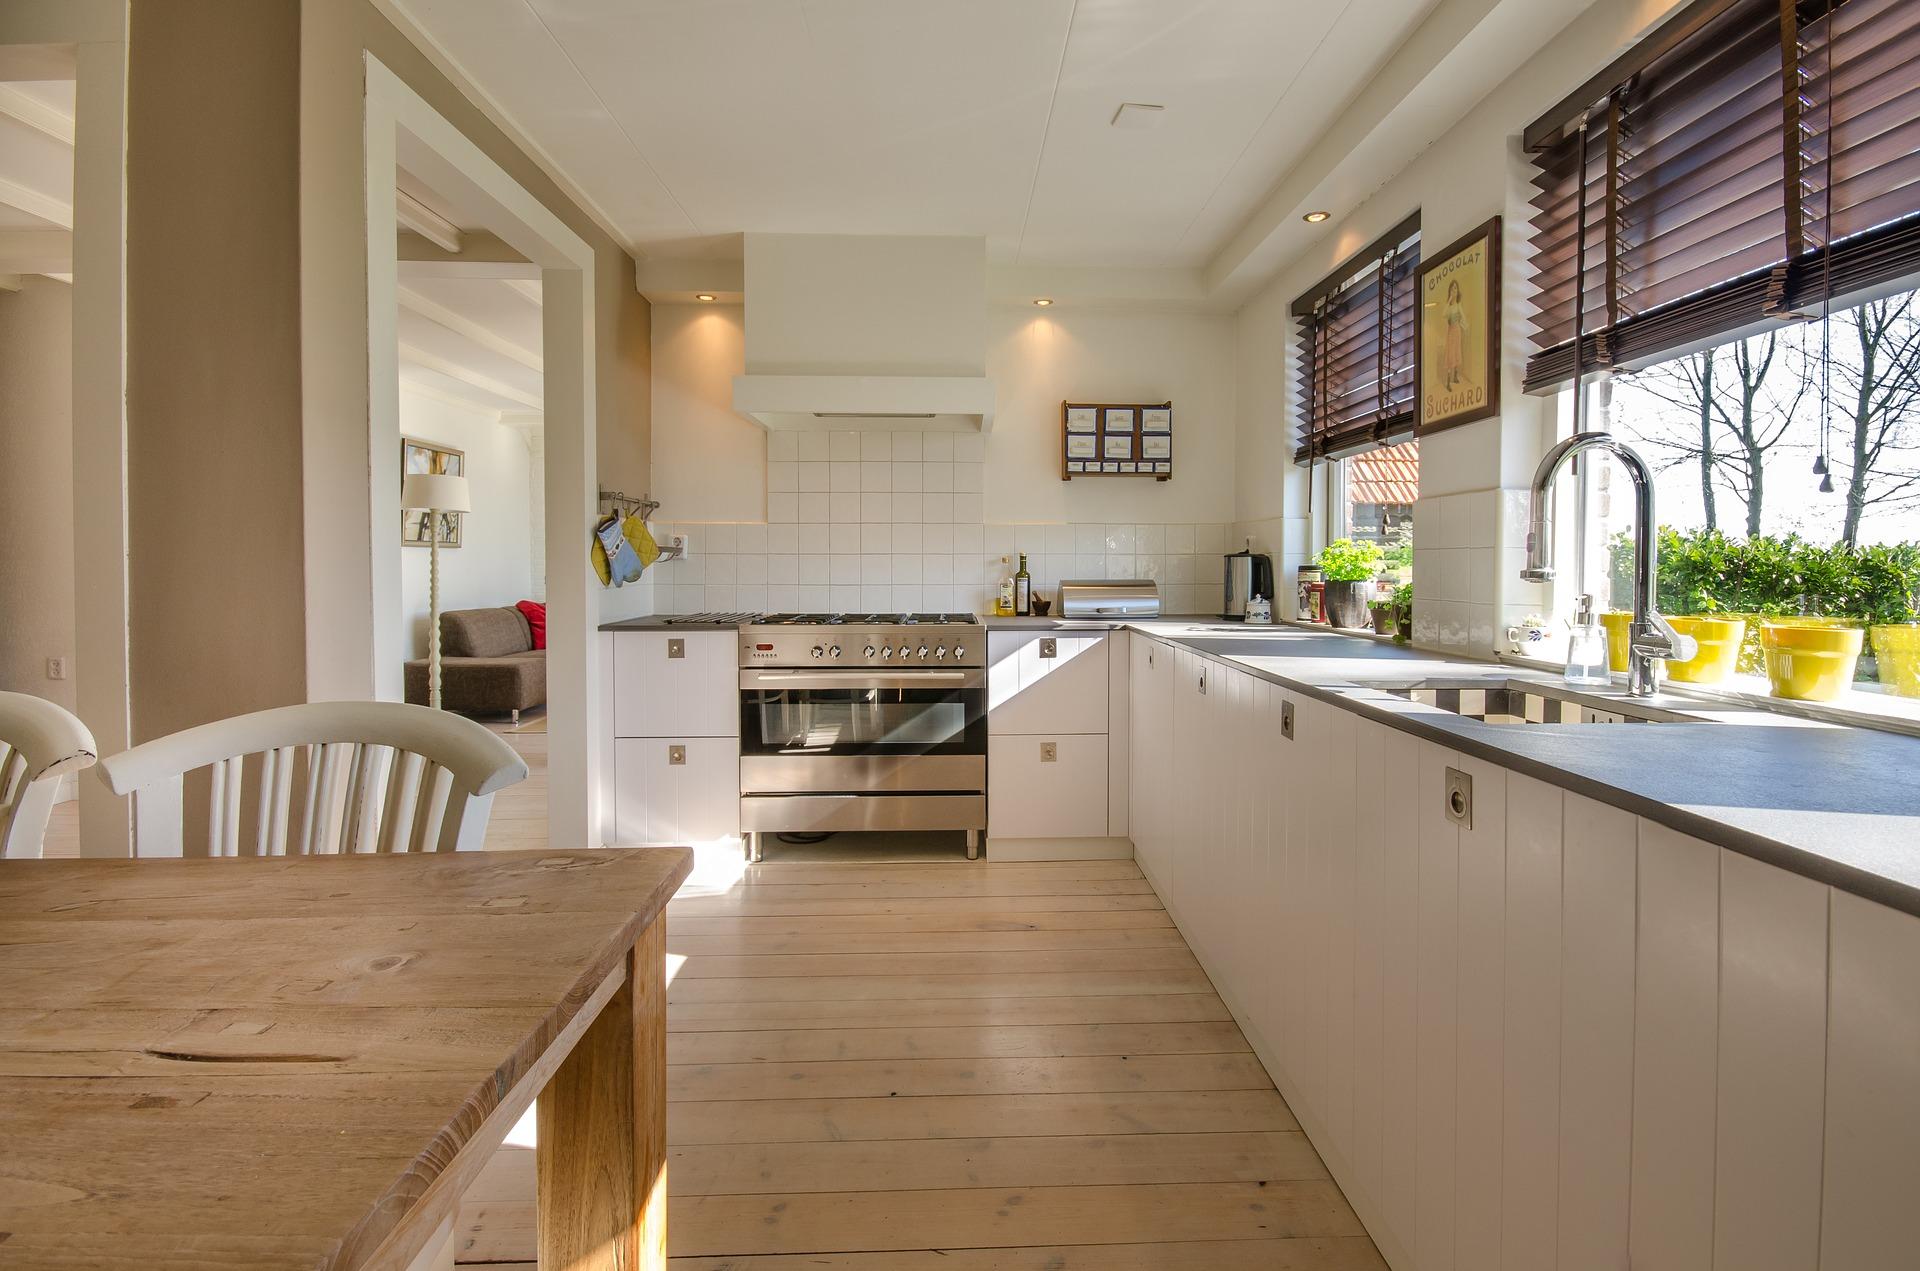 Jak dobrać kuchenkę i pralkę?